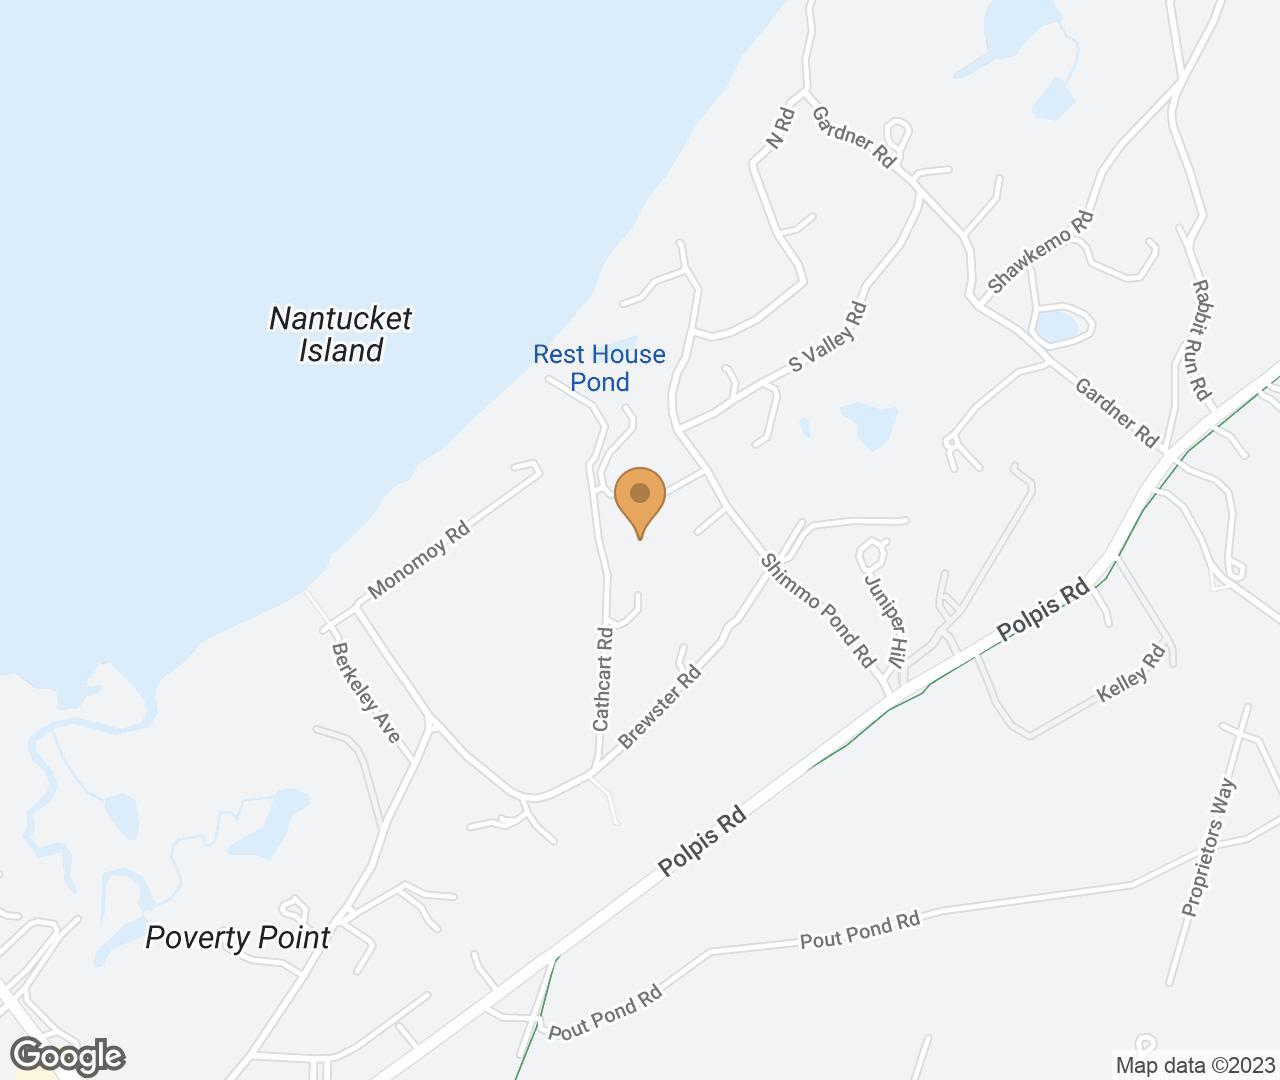 Google Map of 5 & 6 Harborview Drive, Nantucket, MA, USA